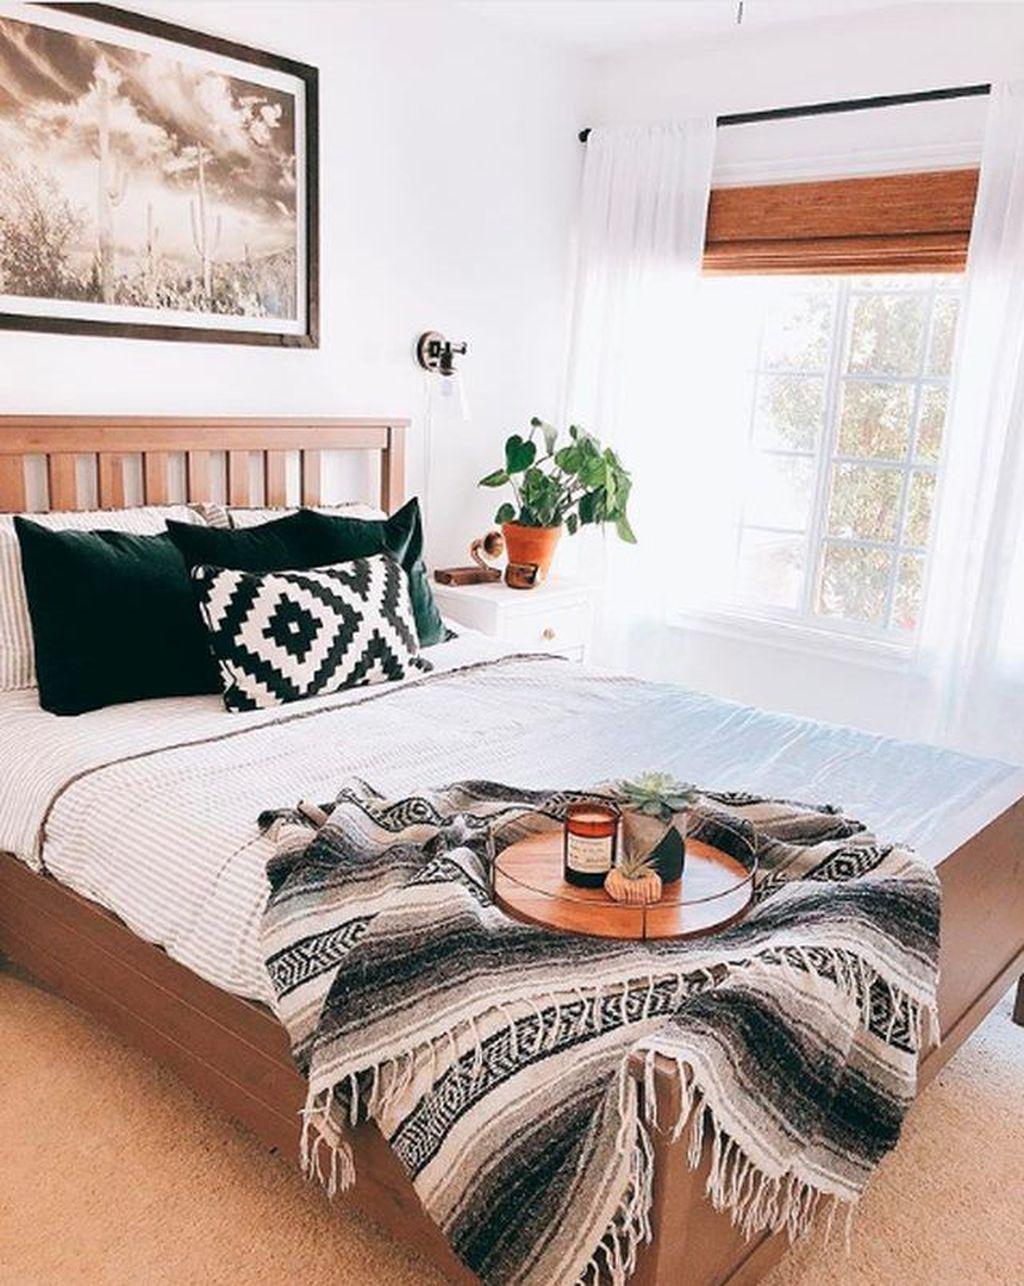 Awesome Boho Chic Bedroom Decor Ideas 25